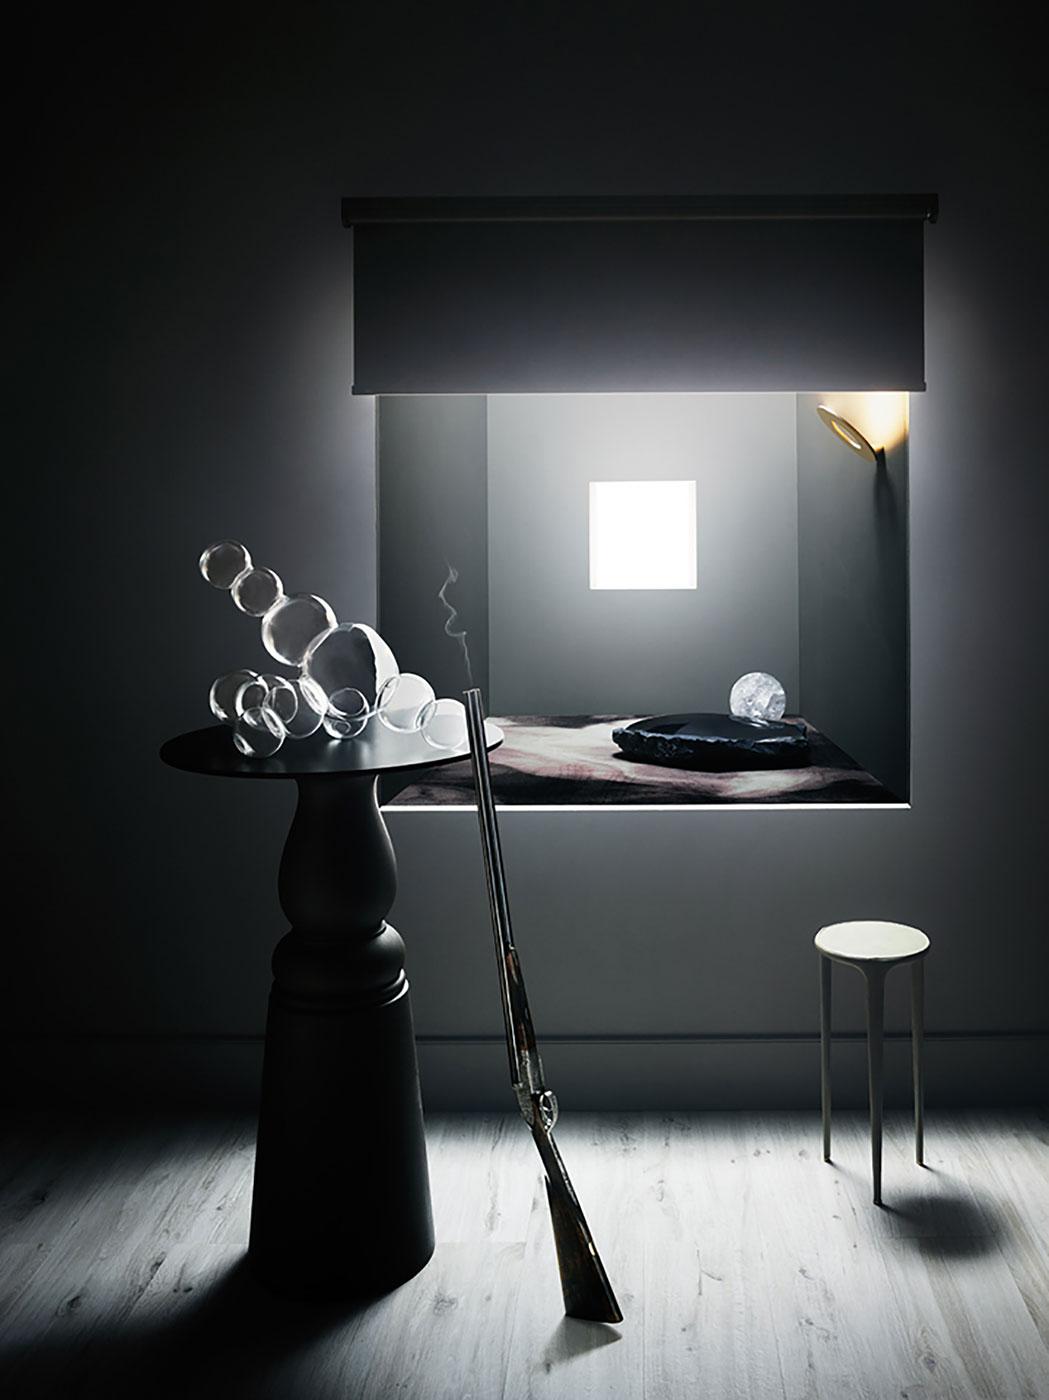 Surrealist interiors by tommaso sartori trendland for Tommaso sartori